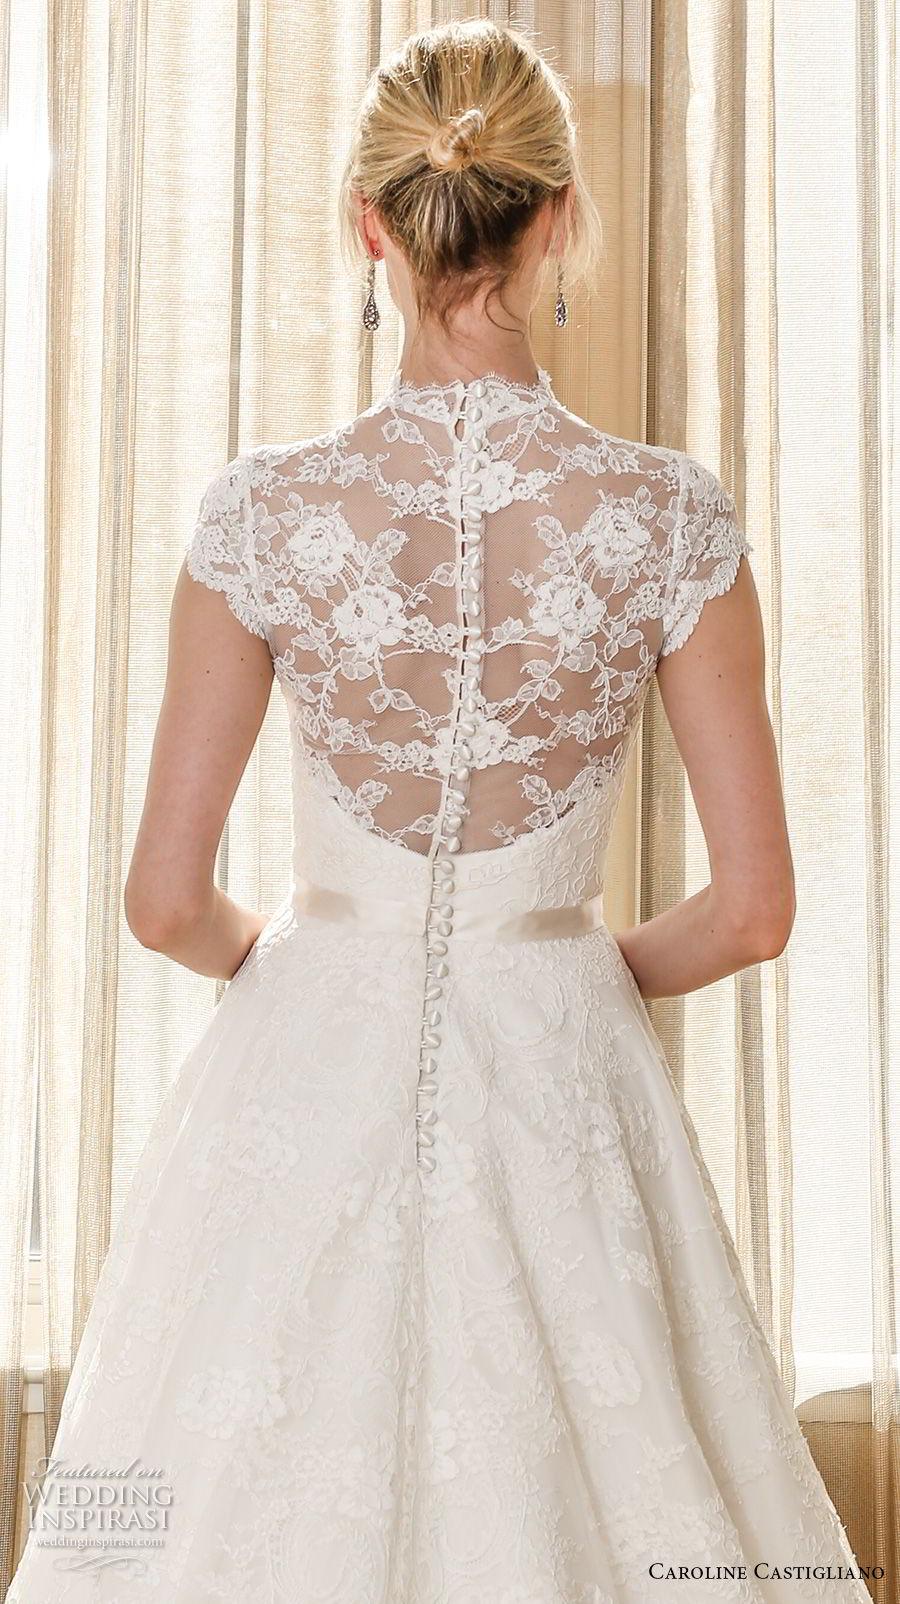 Caroline Castigliano 2019 Wedding Dresses Wedding Inspirasi